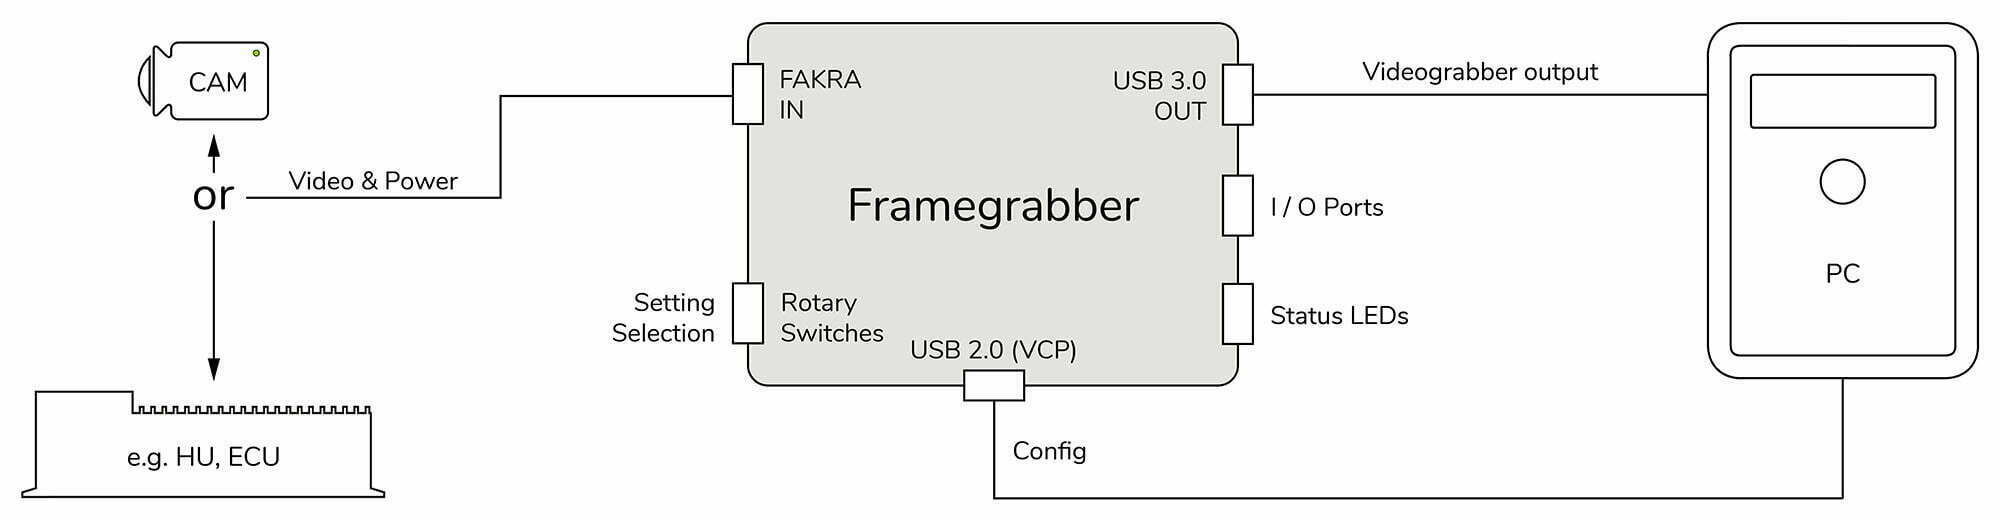 TZ Electronic Systems GmbH - Framegrabber Blockschaltbild